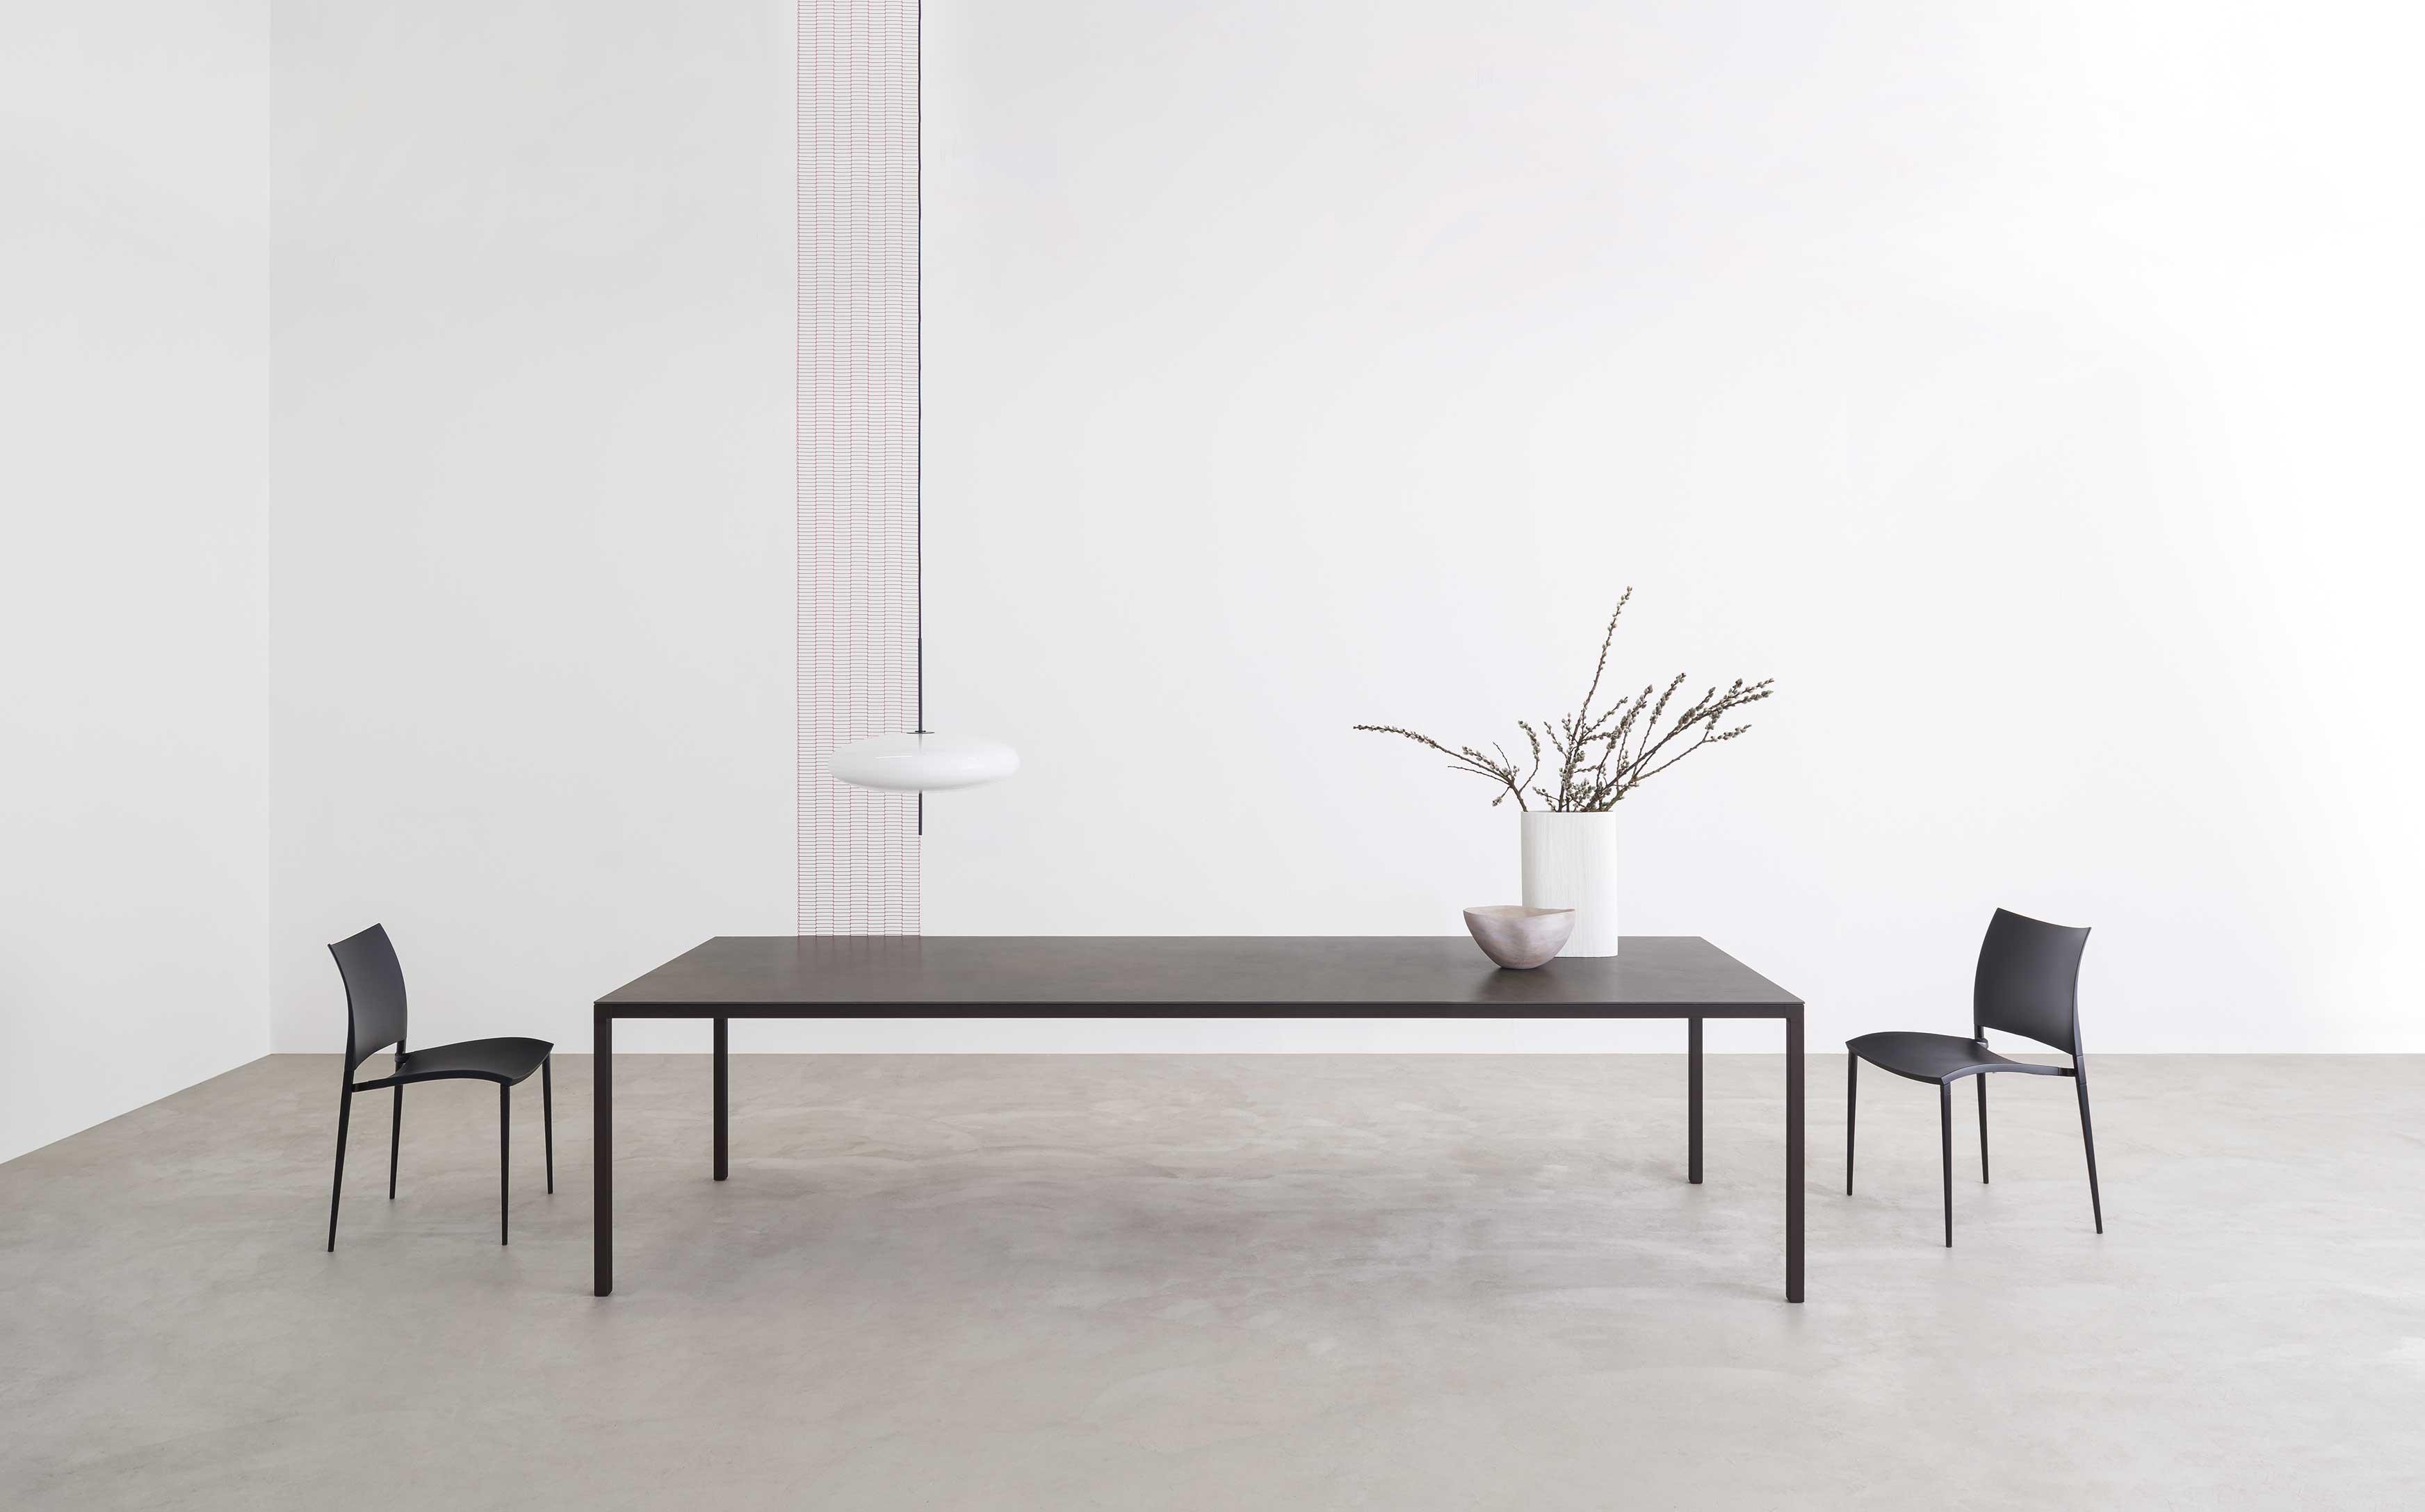 Corian Tafelblad Rond.Tafels Design Meubelen Interieur Plus